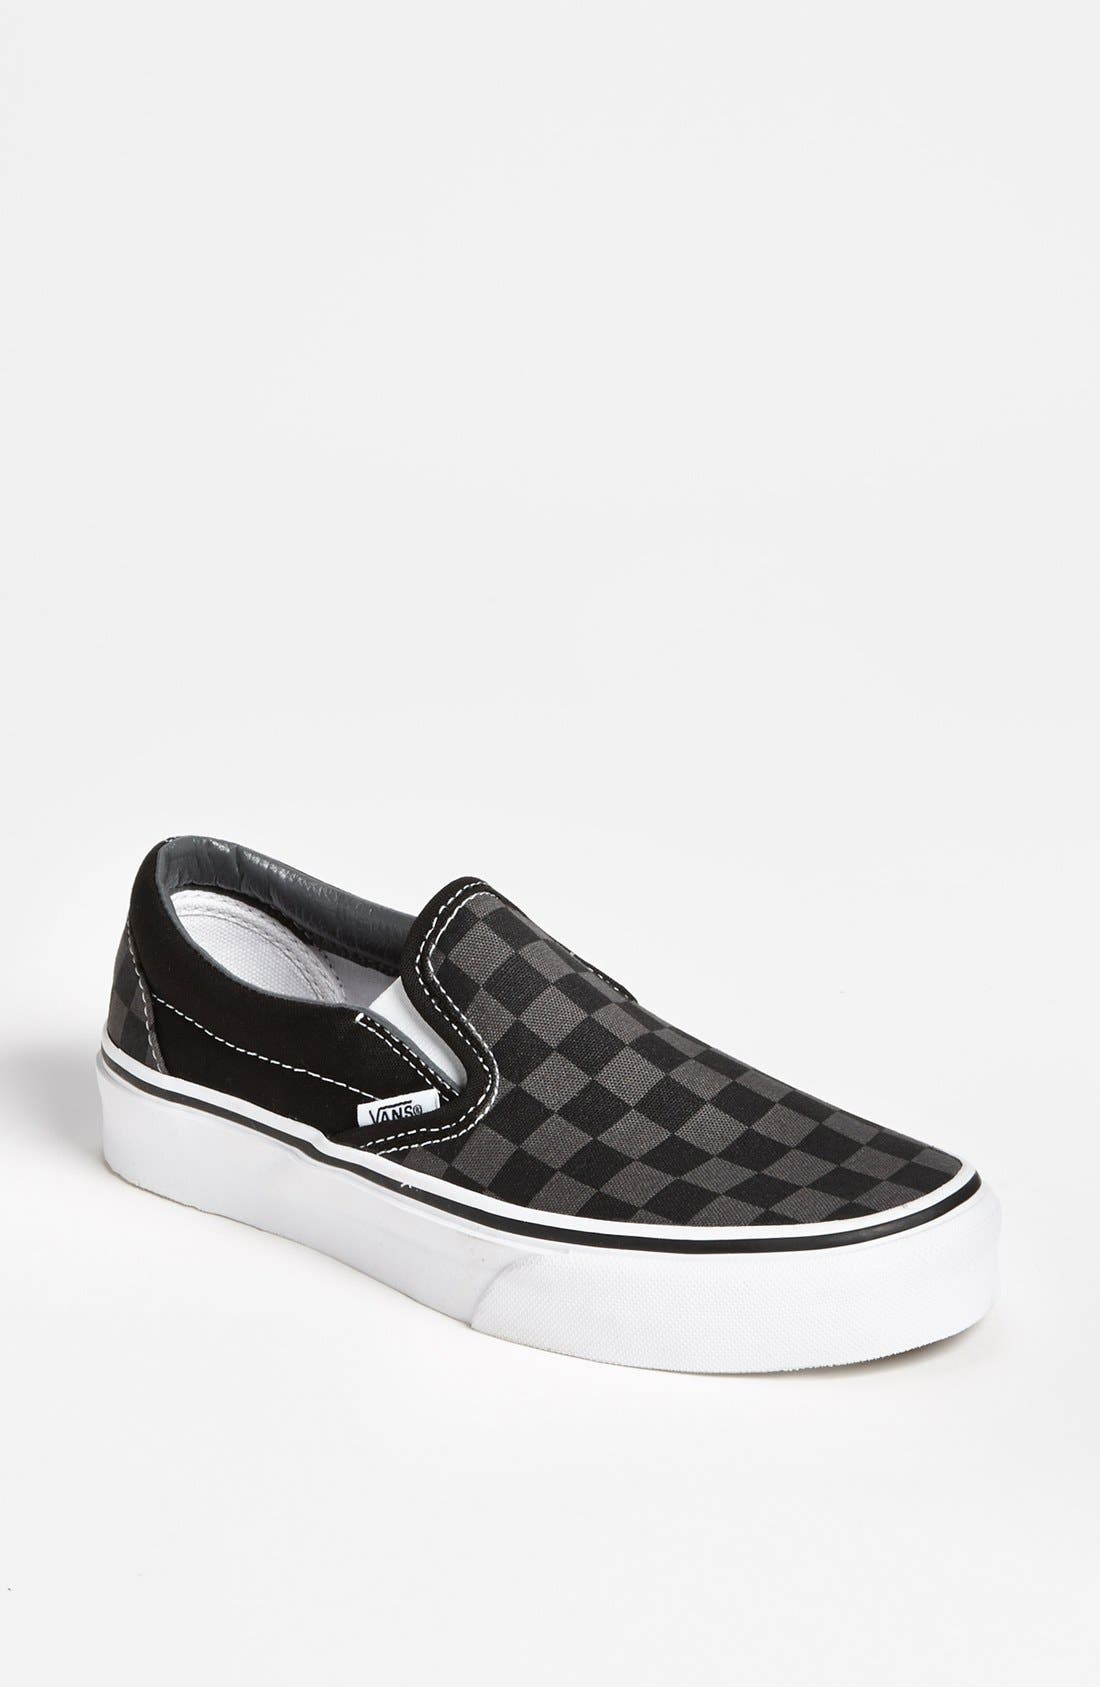 Main Image - Vans 'Classic - Checker' Sneaker (Women)